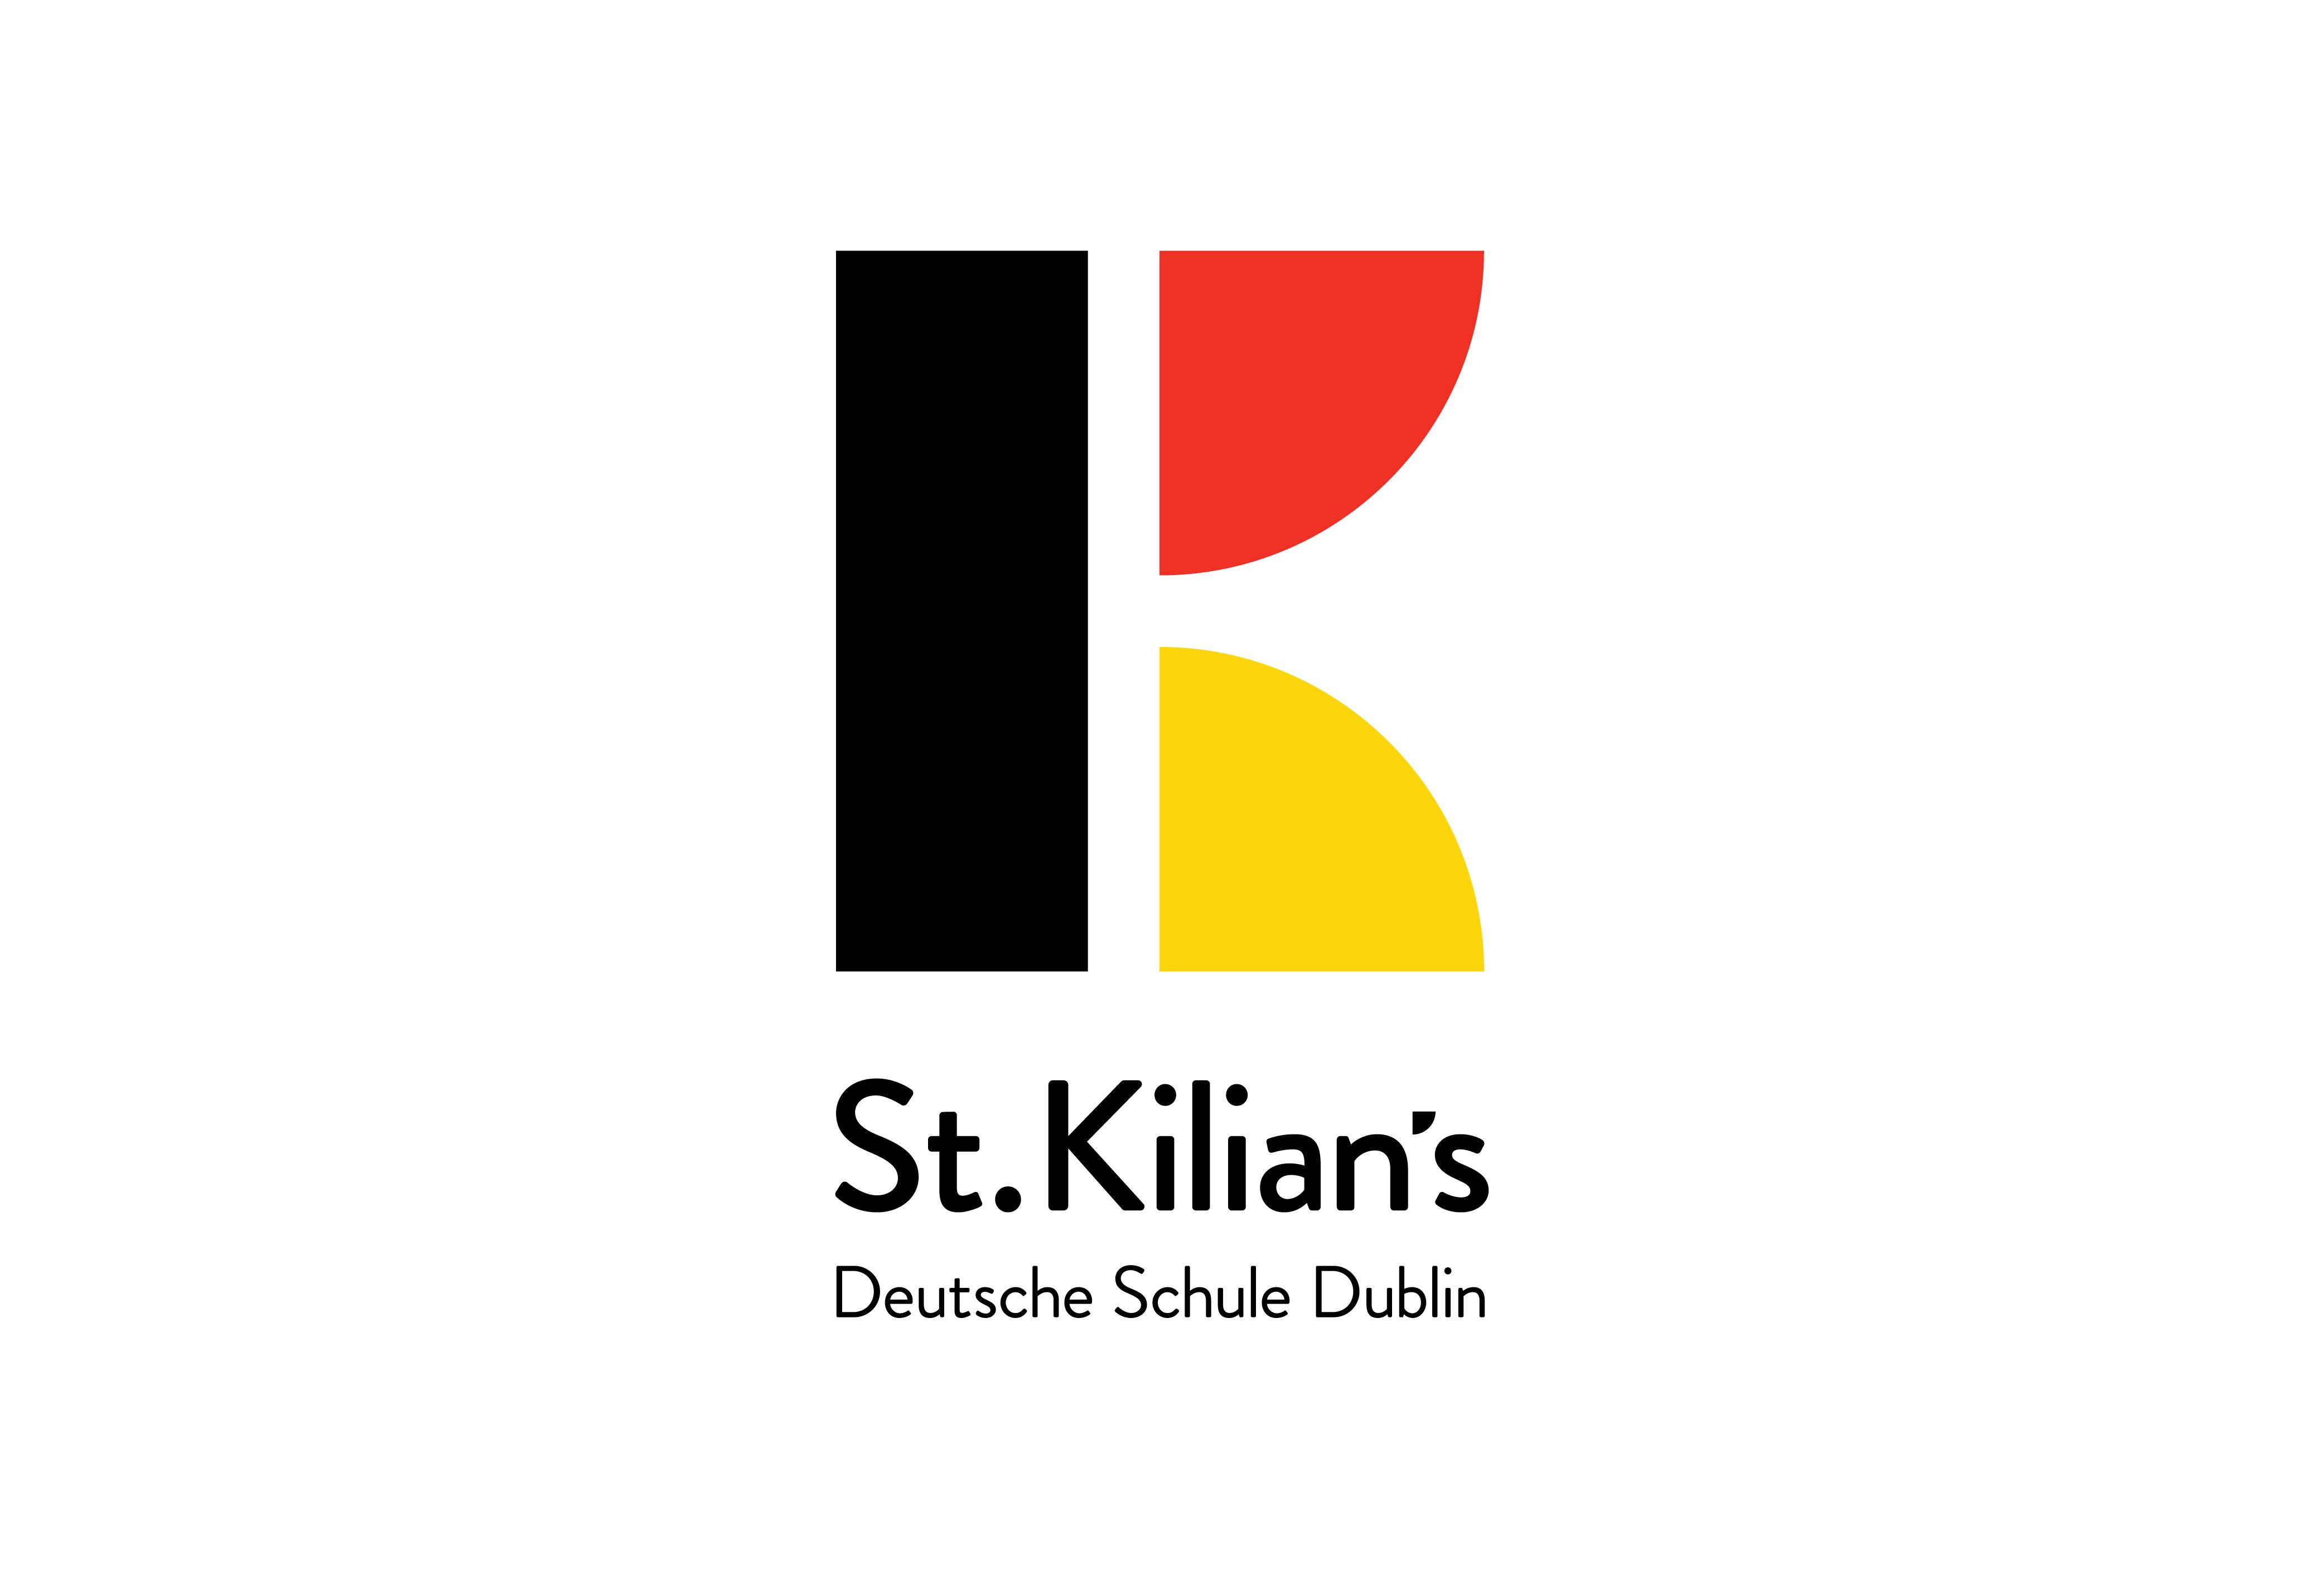 Cover image: St. Kilian's Rebrand